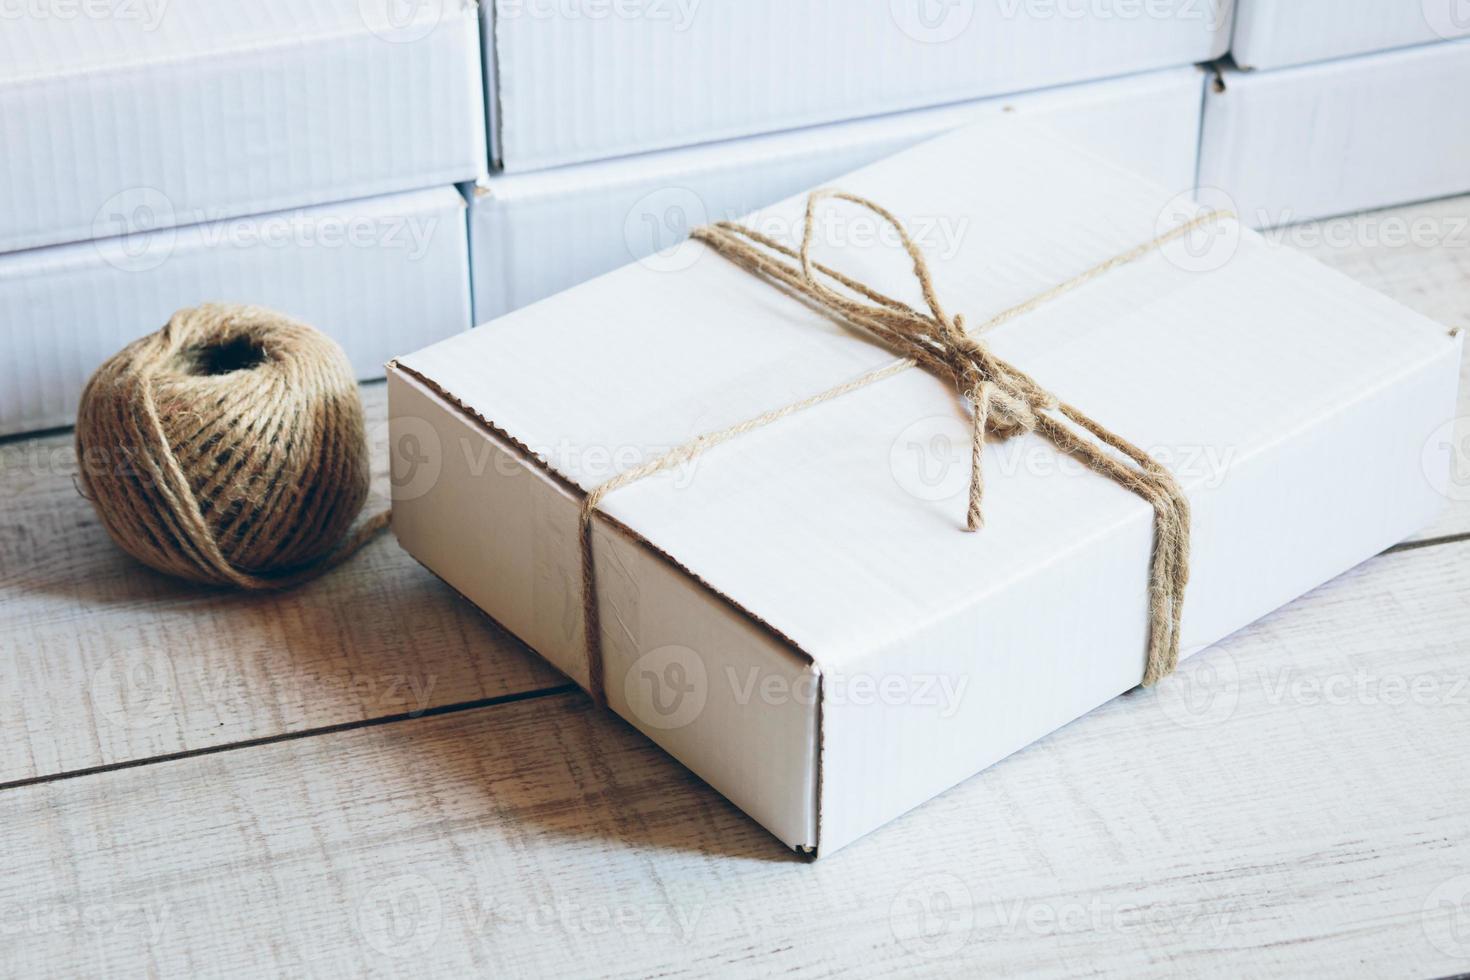 paquete sobre la mesa foto